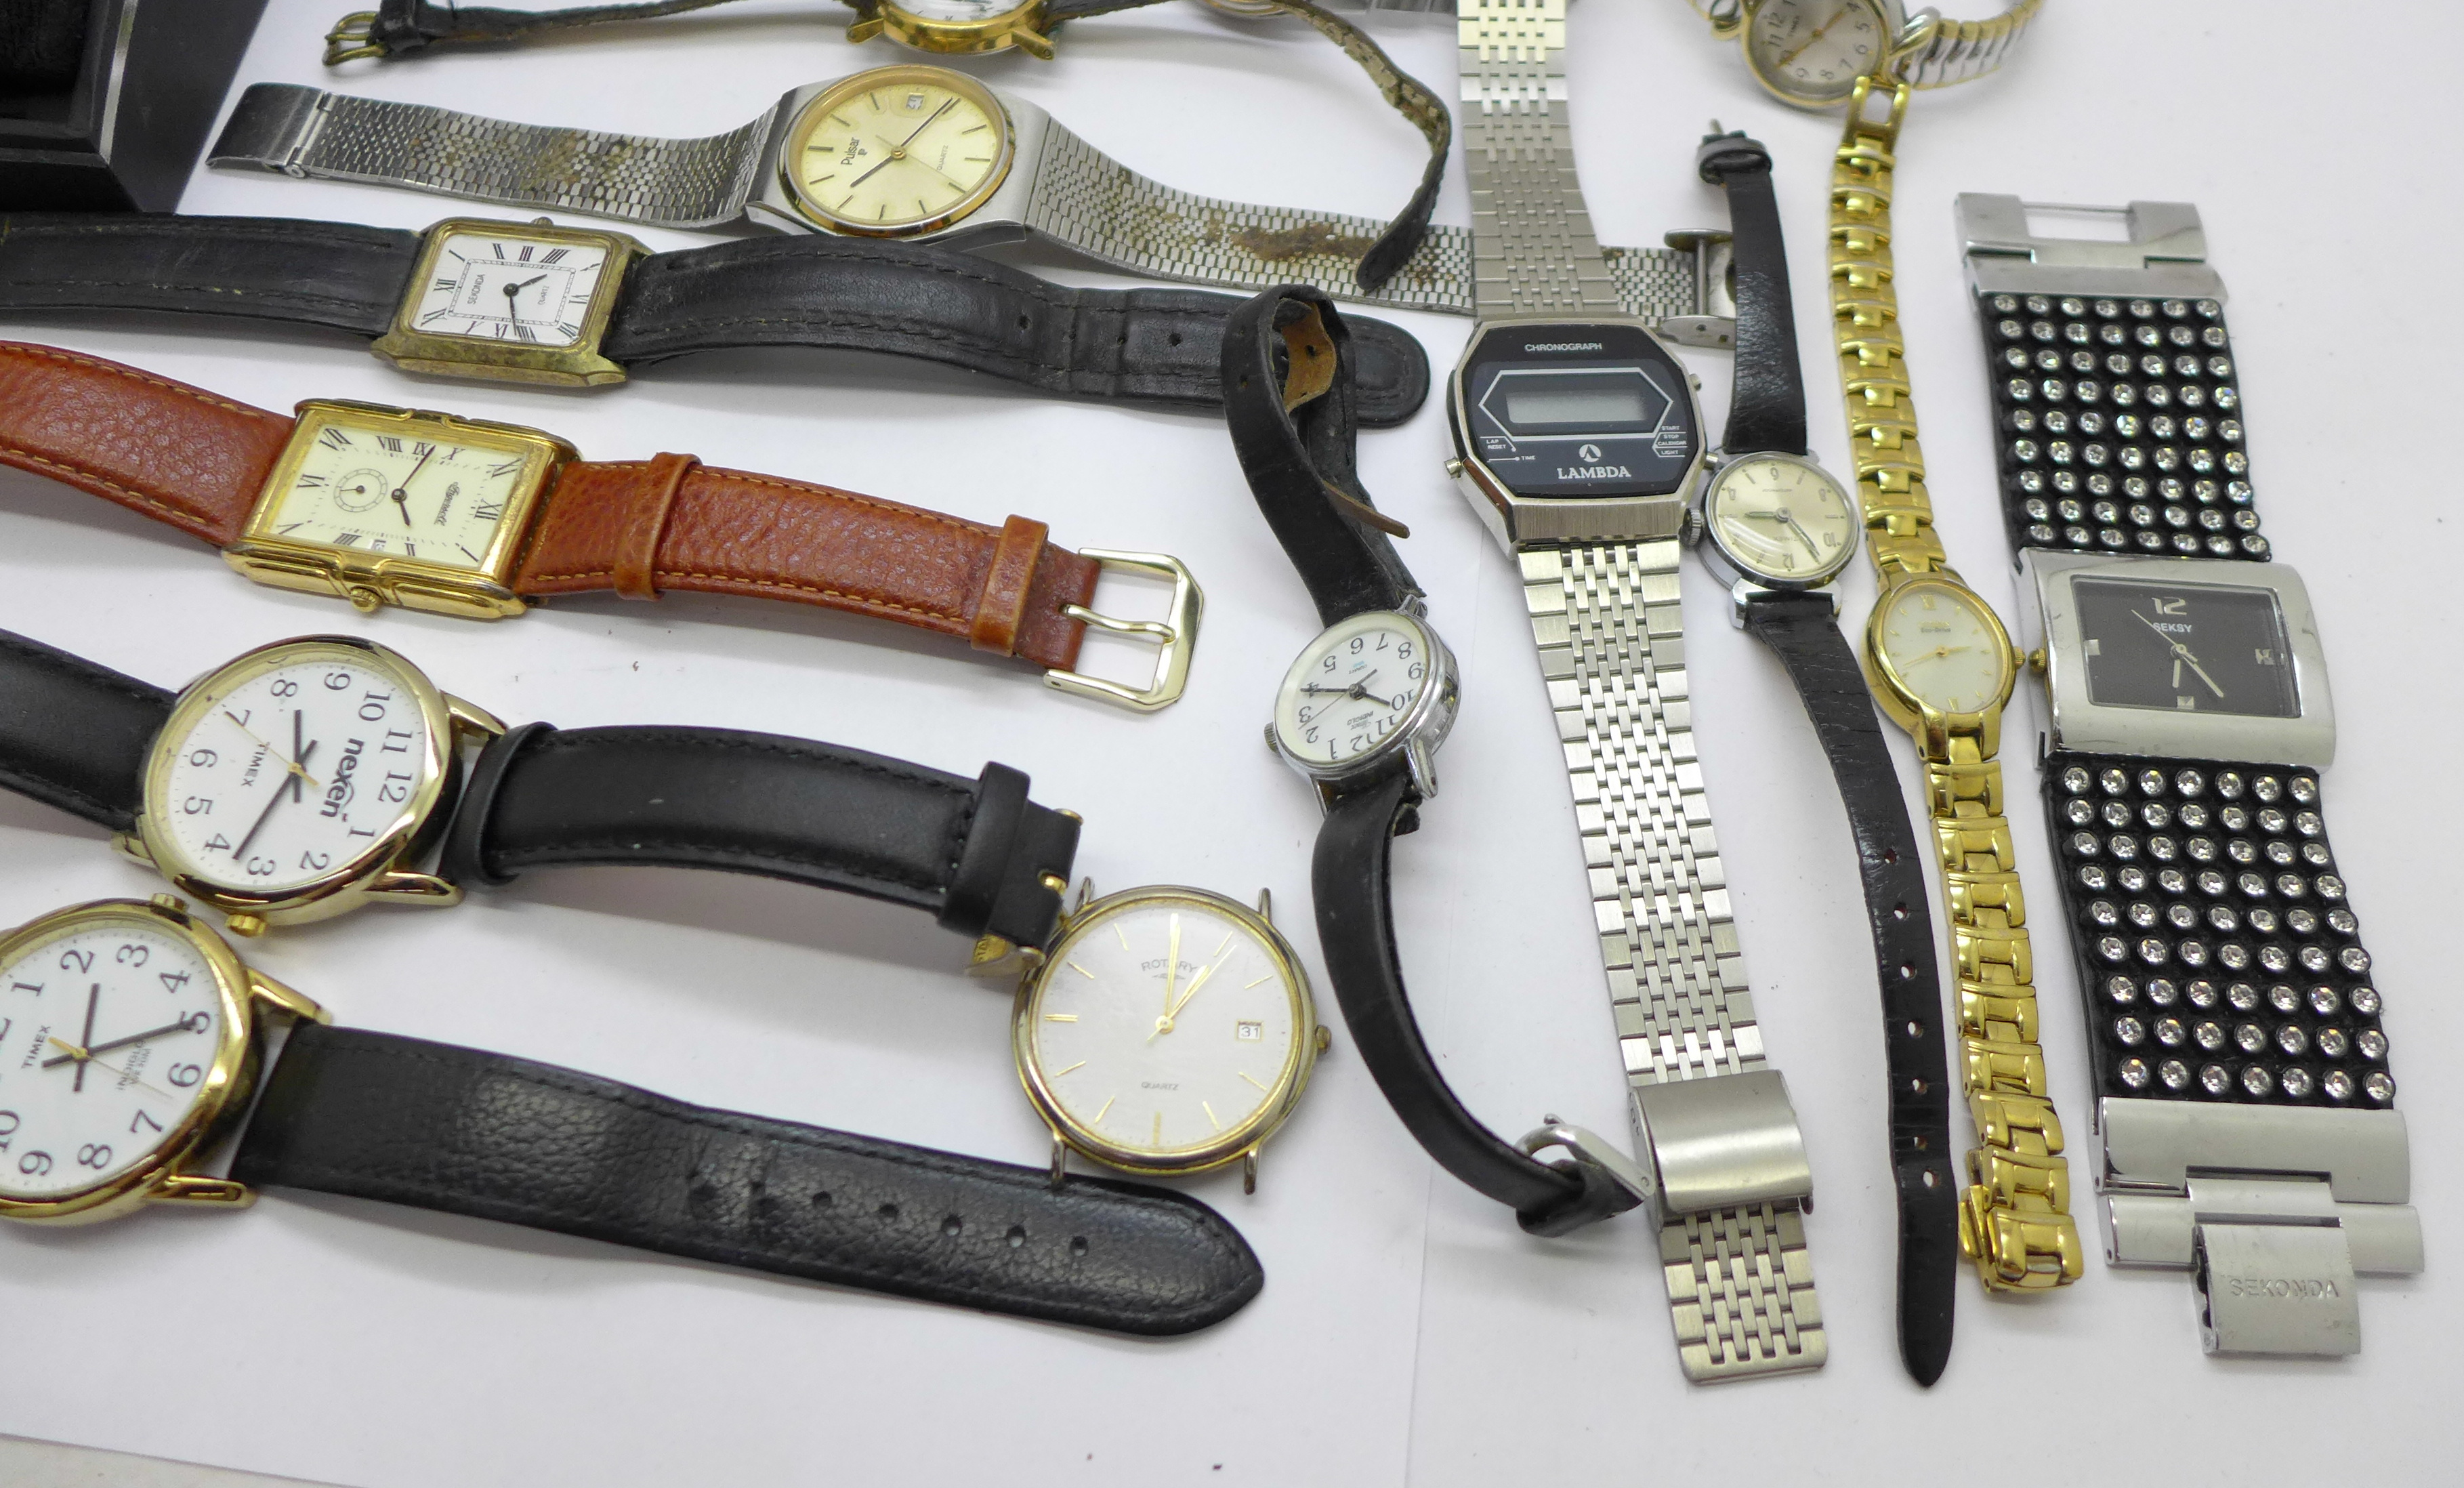 Wristwatches including Sekonda, Seiko, Ingersoll, Rotary, etc. - Image 3 of 5